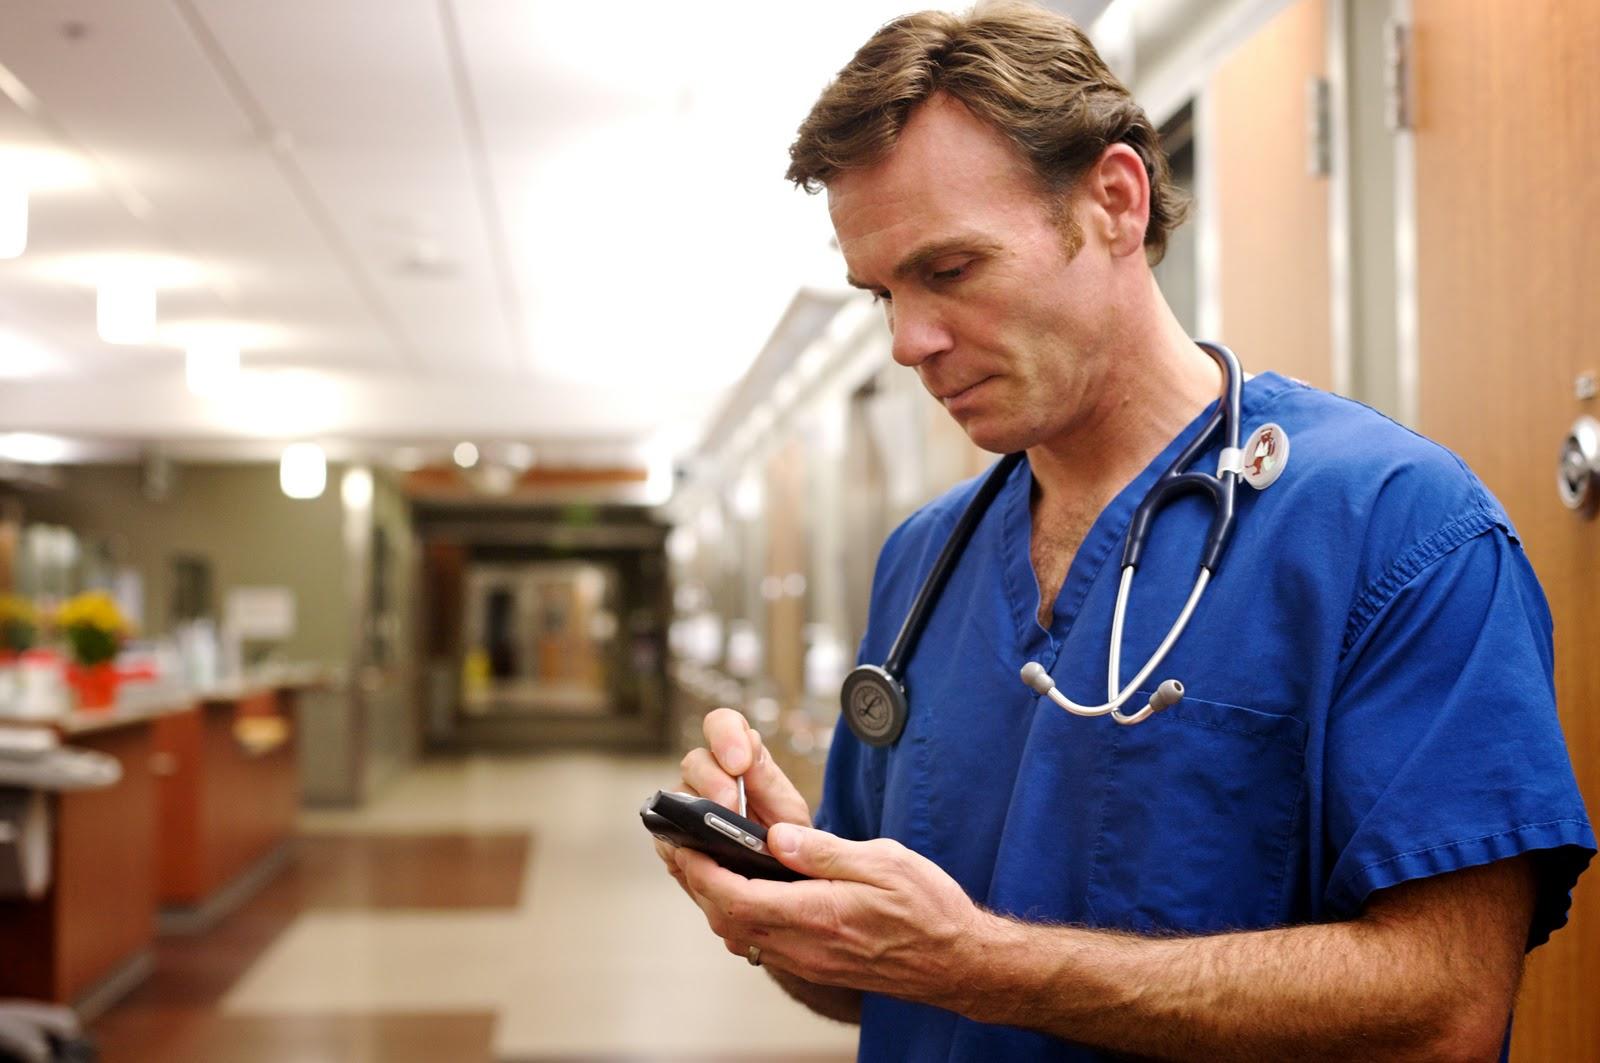 hospital_mobiledevice